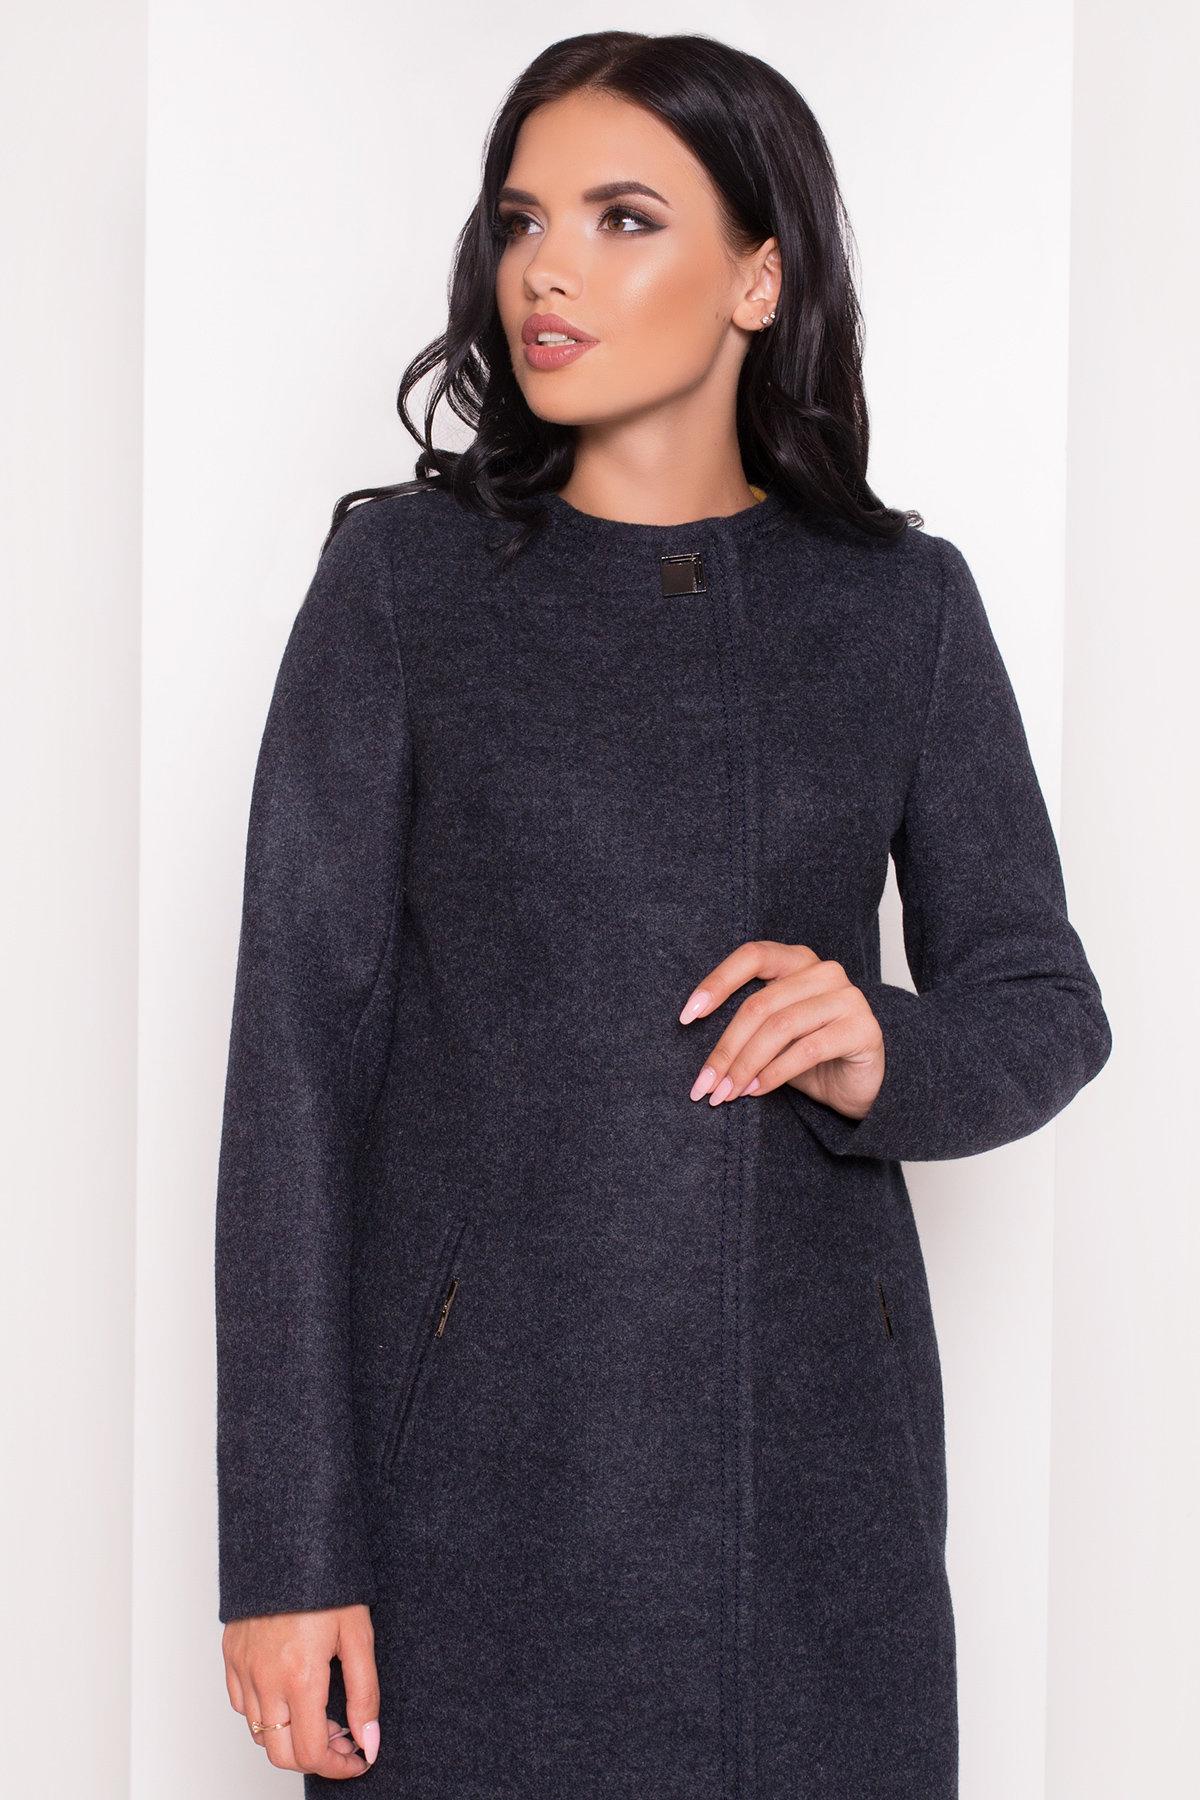 Демисезонное пальто Ферран 5369 АРТ. 36594 Цвет: Темно-синий - фото 2, интернет магазин tm-modus.ru